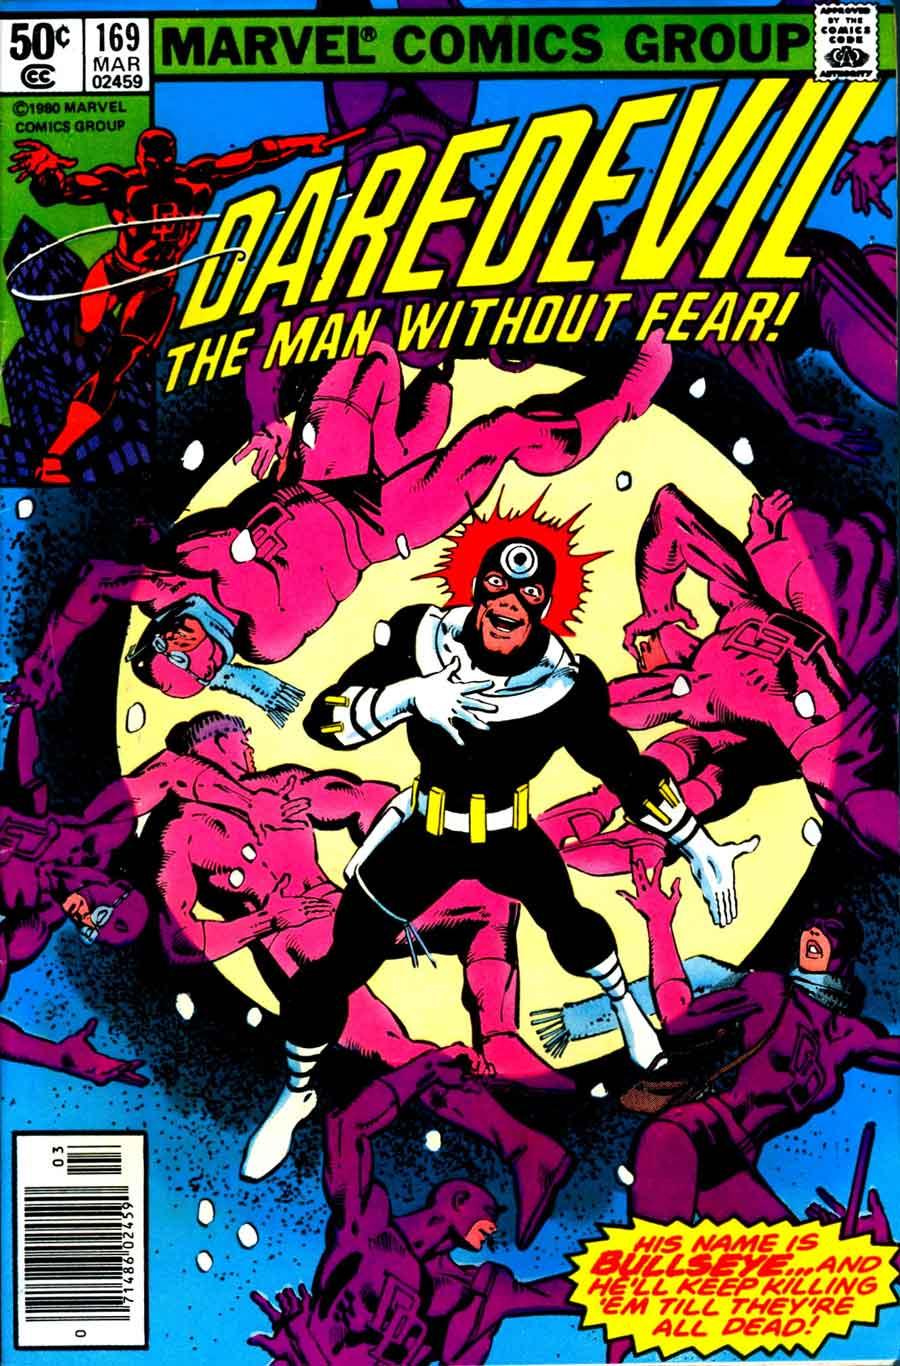 Comic Book Cover Drawing : Daredevil frank miller art cover pencil ink